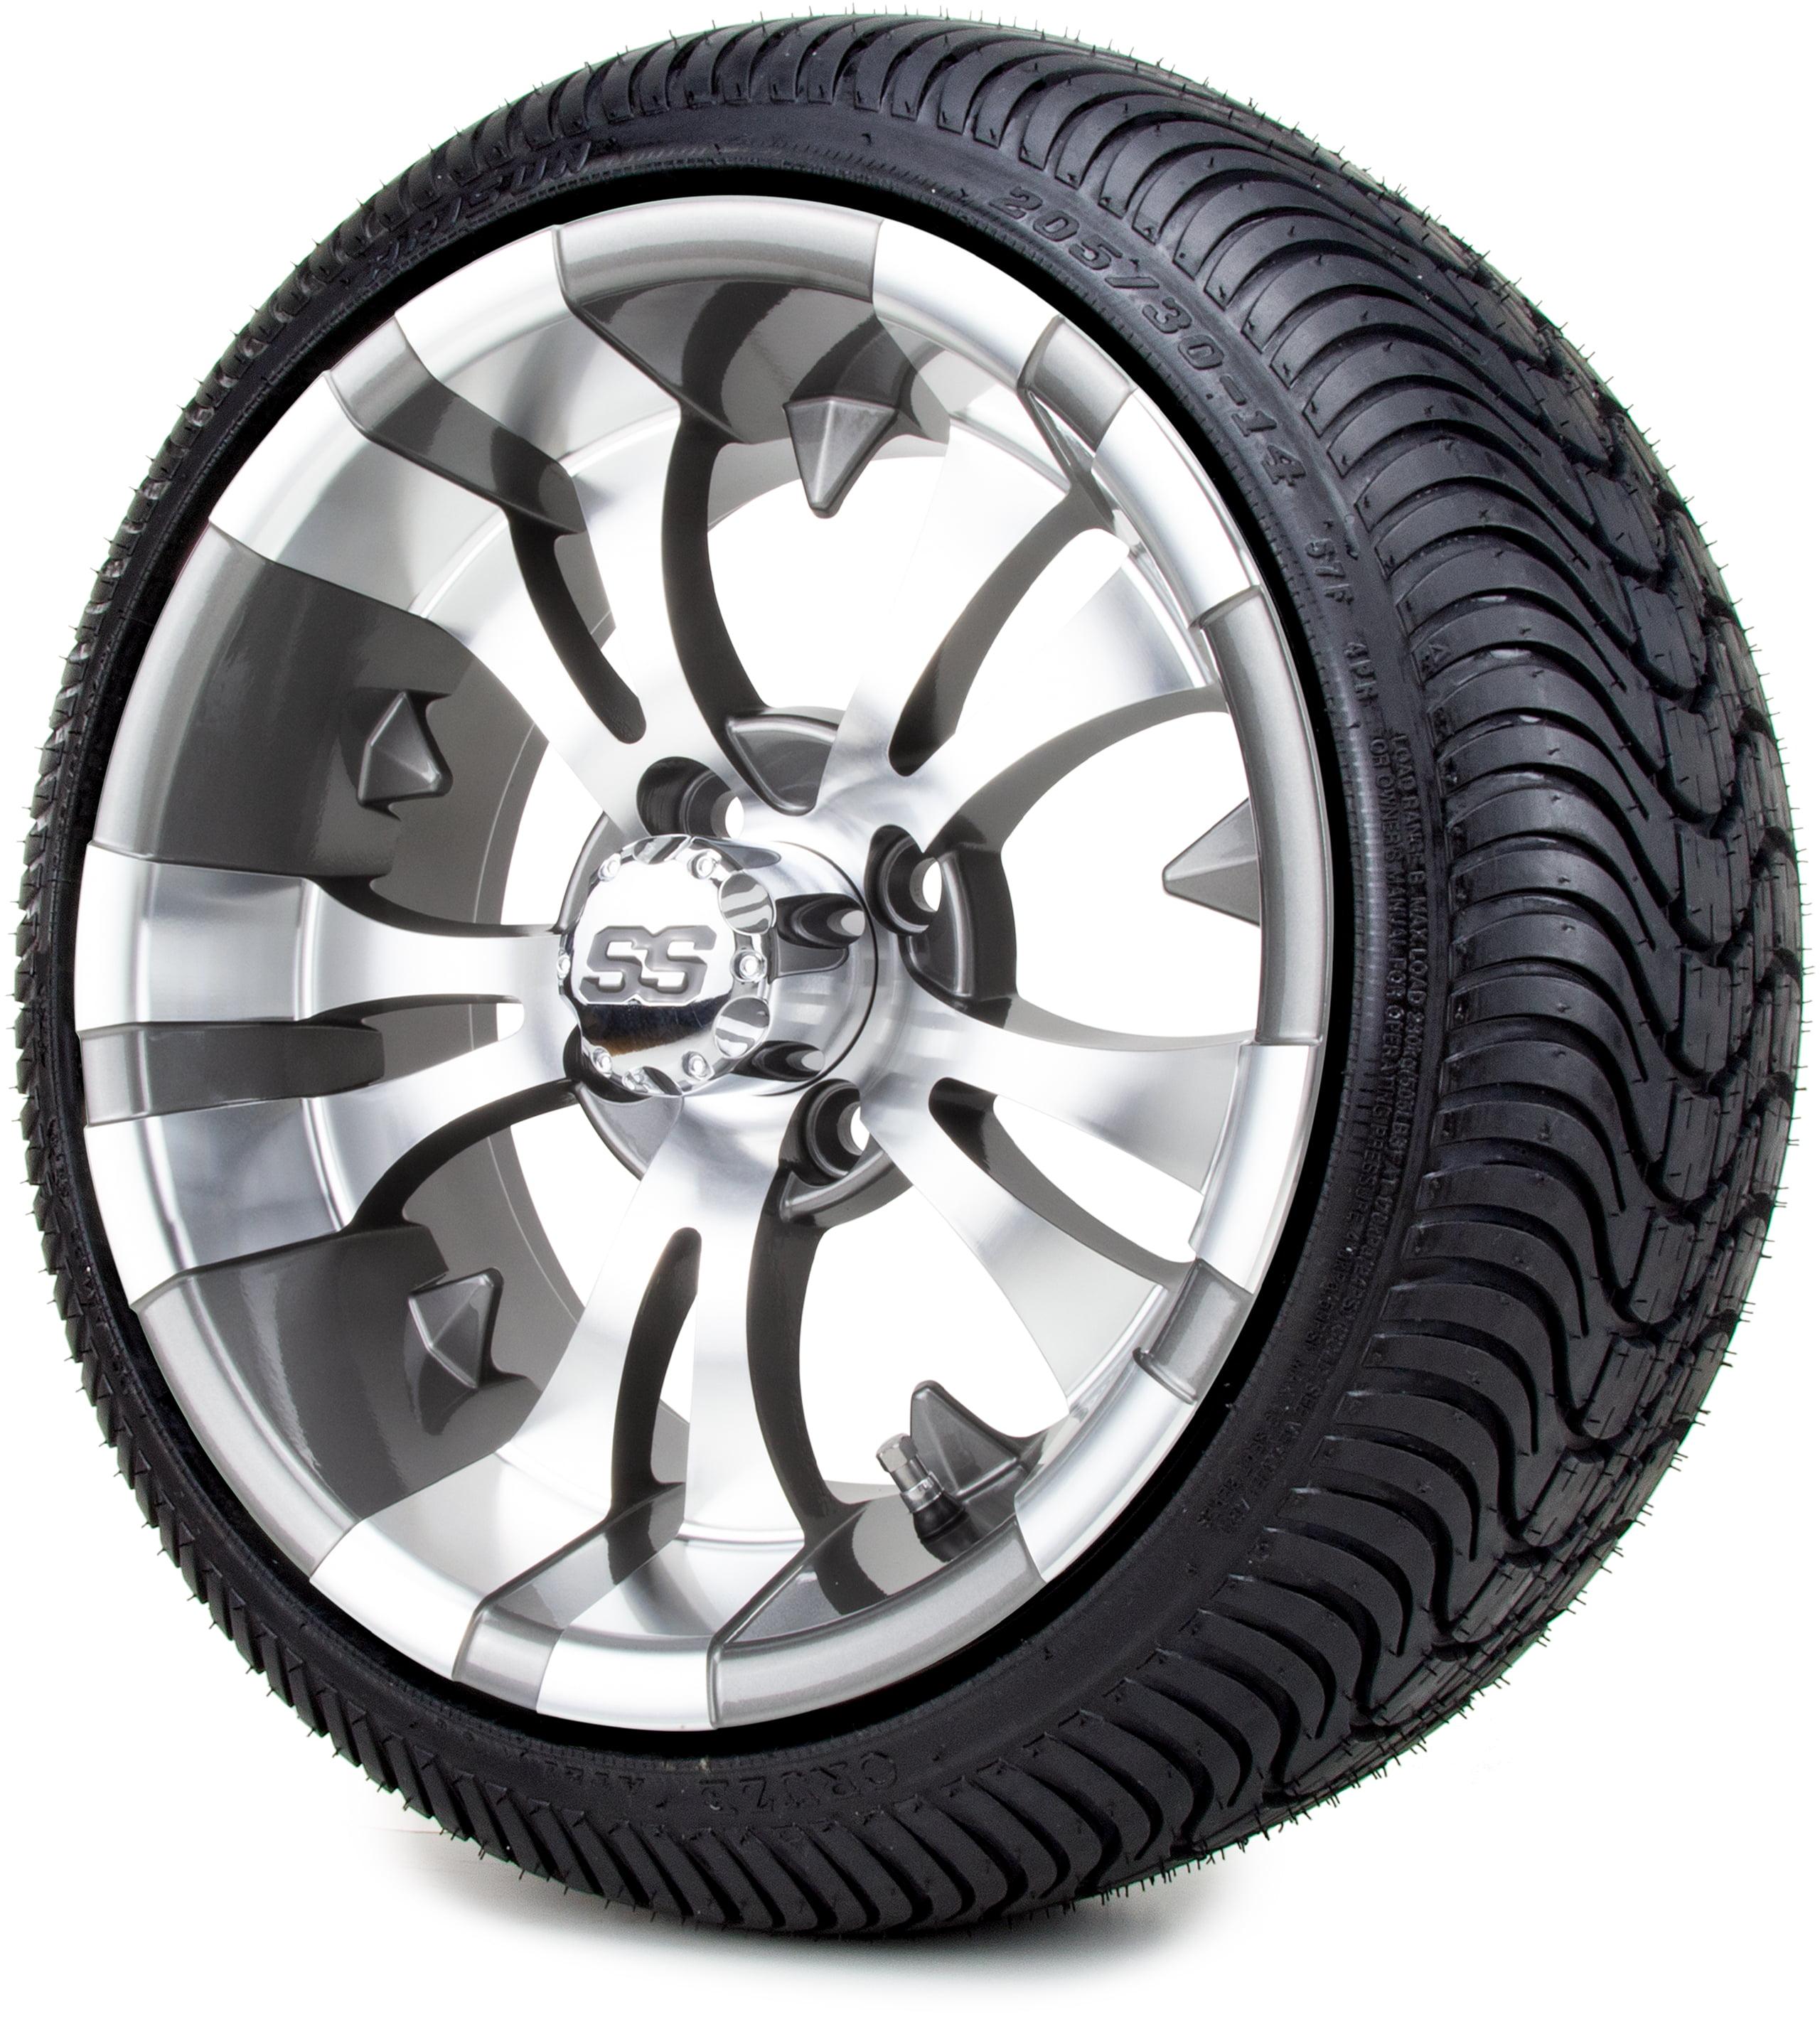 14 Modz Vampire Gunmetal Golf Cart Wheels And Low Profile Tires Combo Set Of 4 Walmart Com Walmart Com